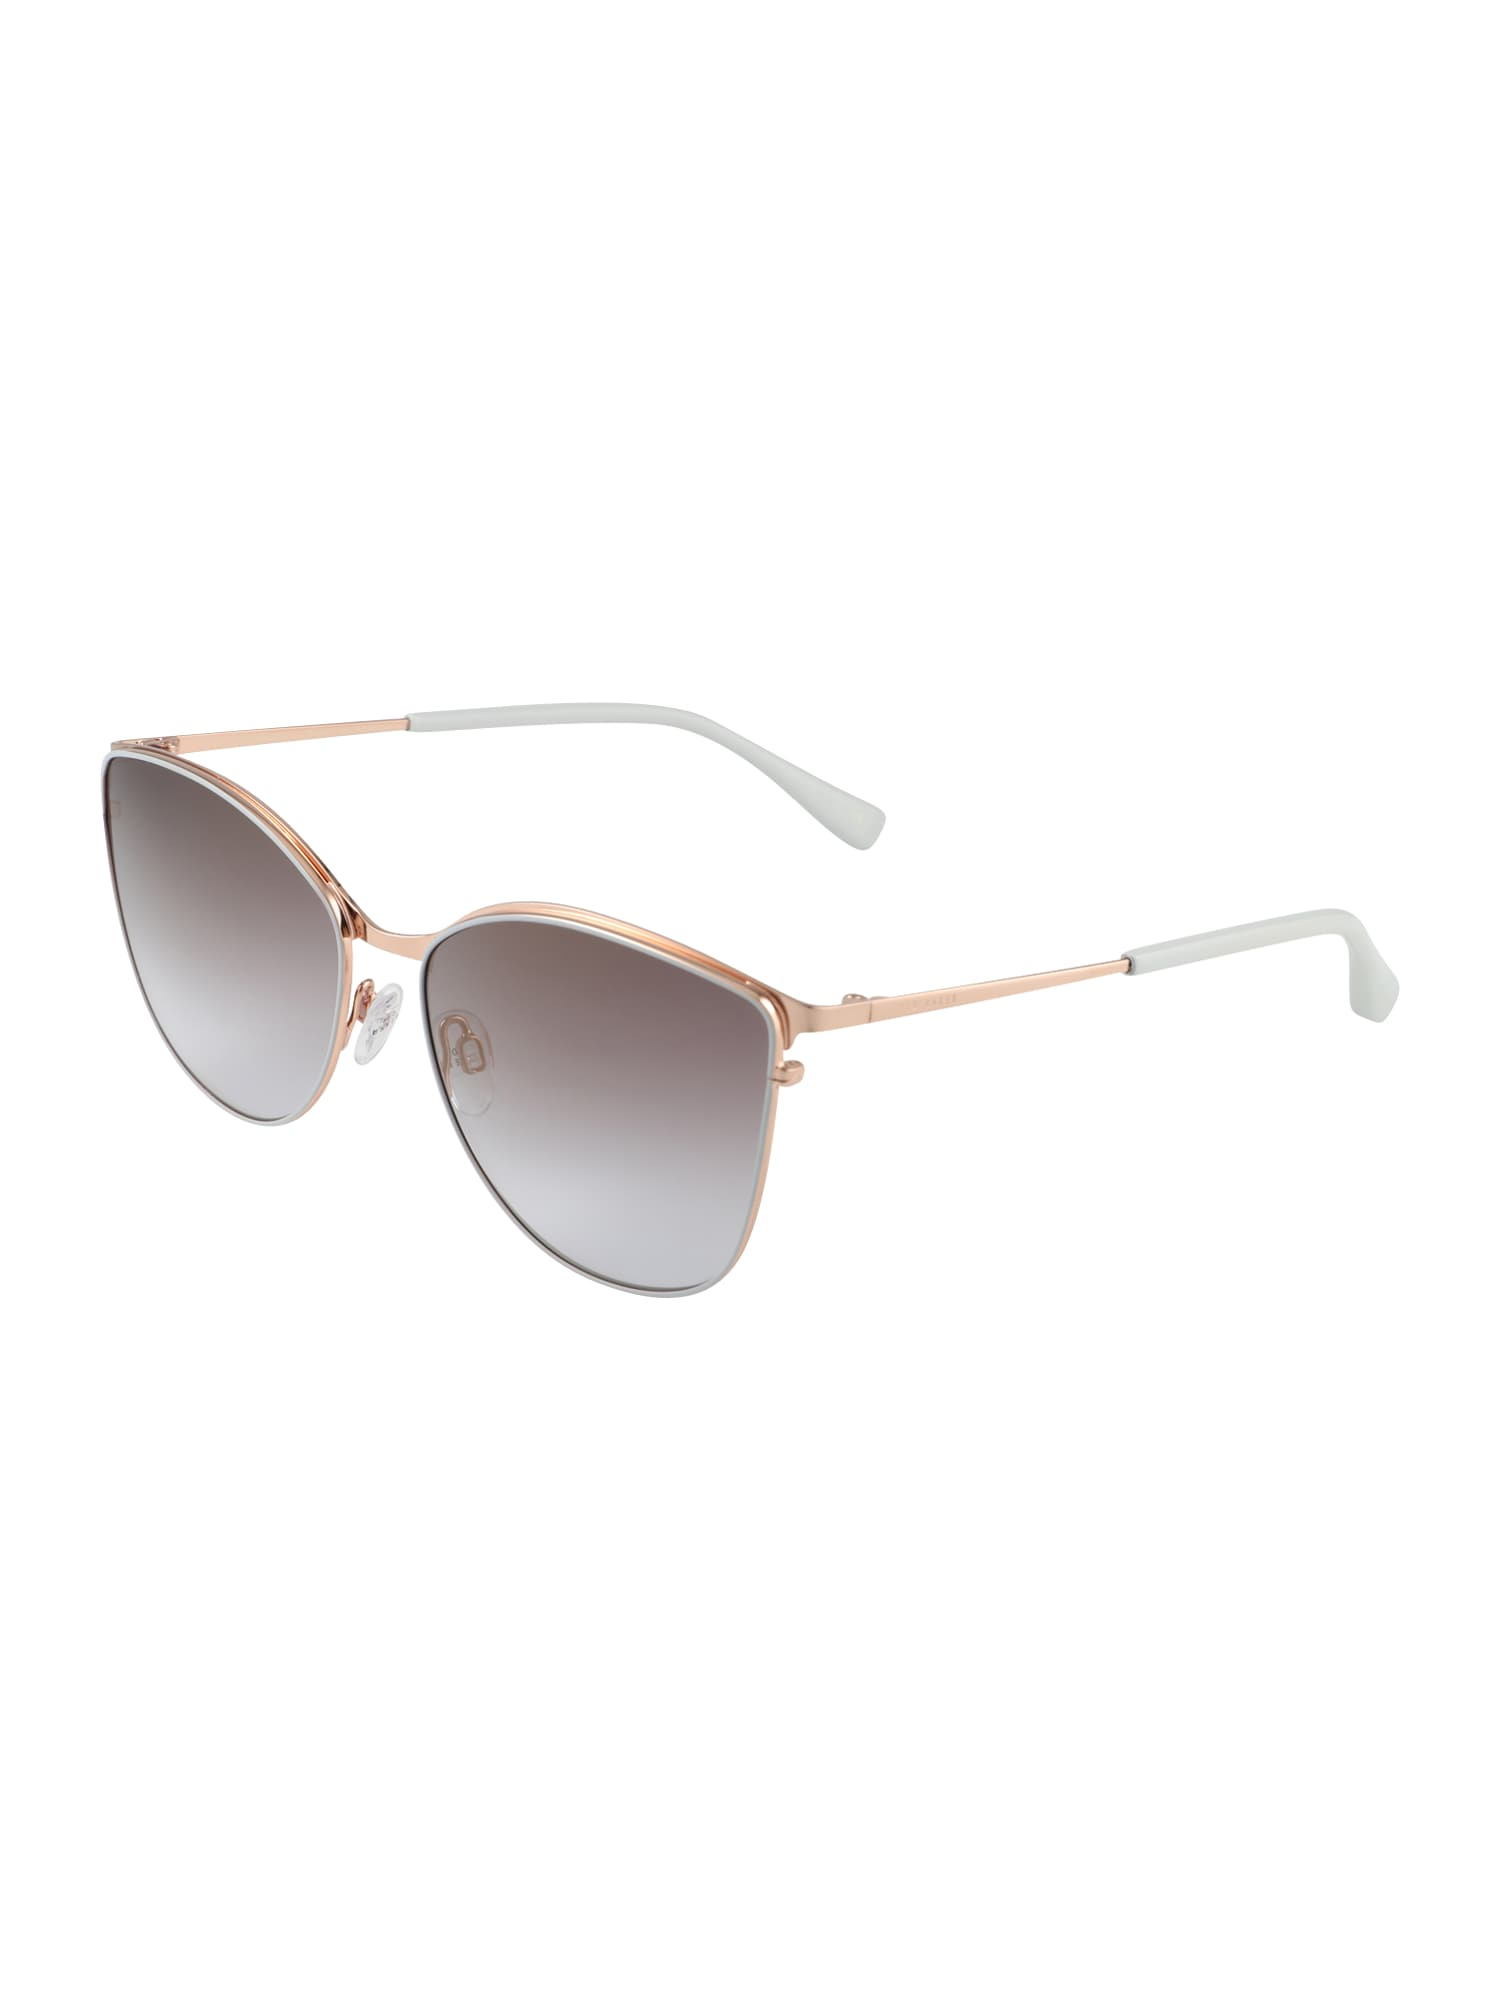 Sonnenbrille | Accessoires > Sonnenbrillen | Ted Baker